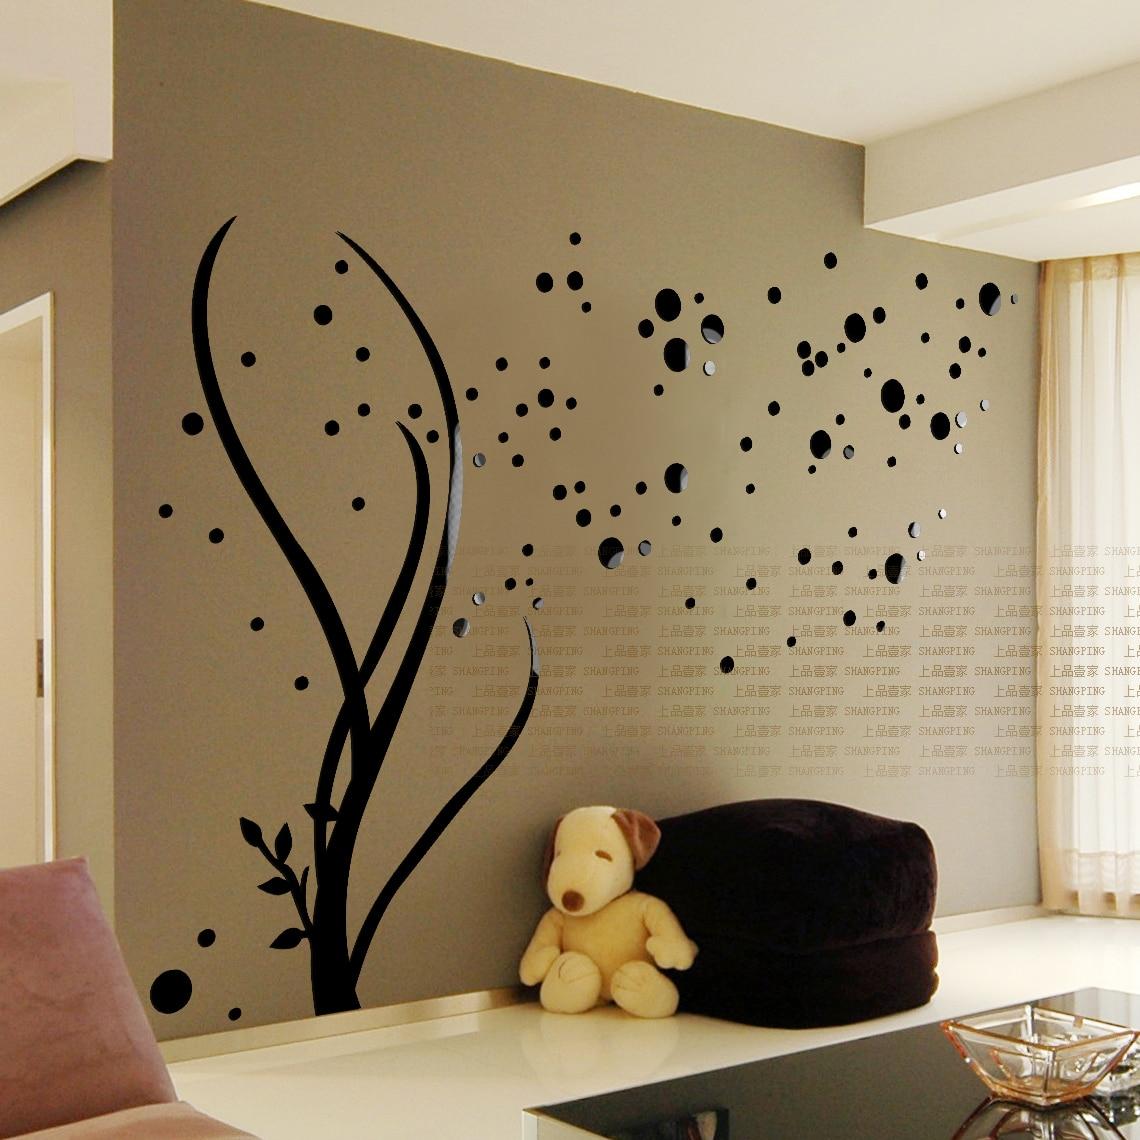 Online Get Cheap Living Room Tv Wall -Aliexpress.com | Alibaba Group